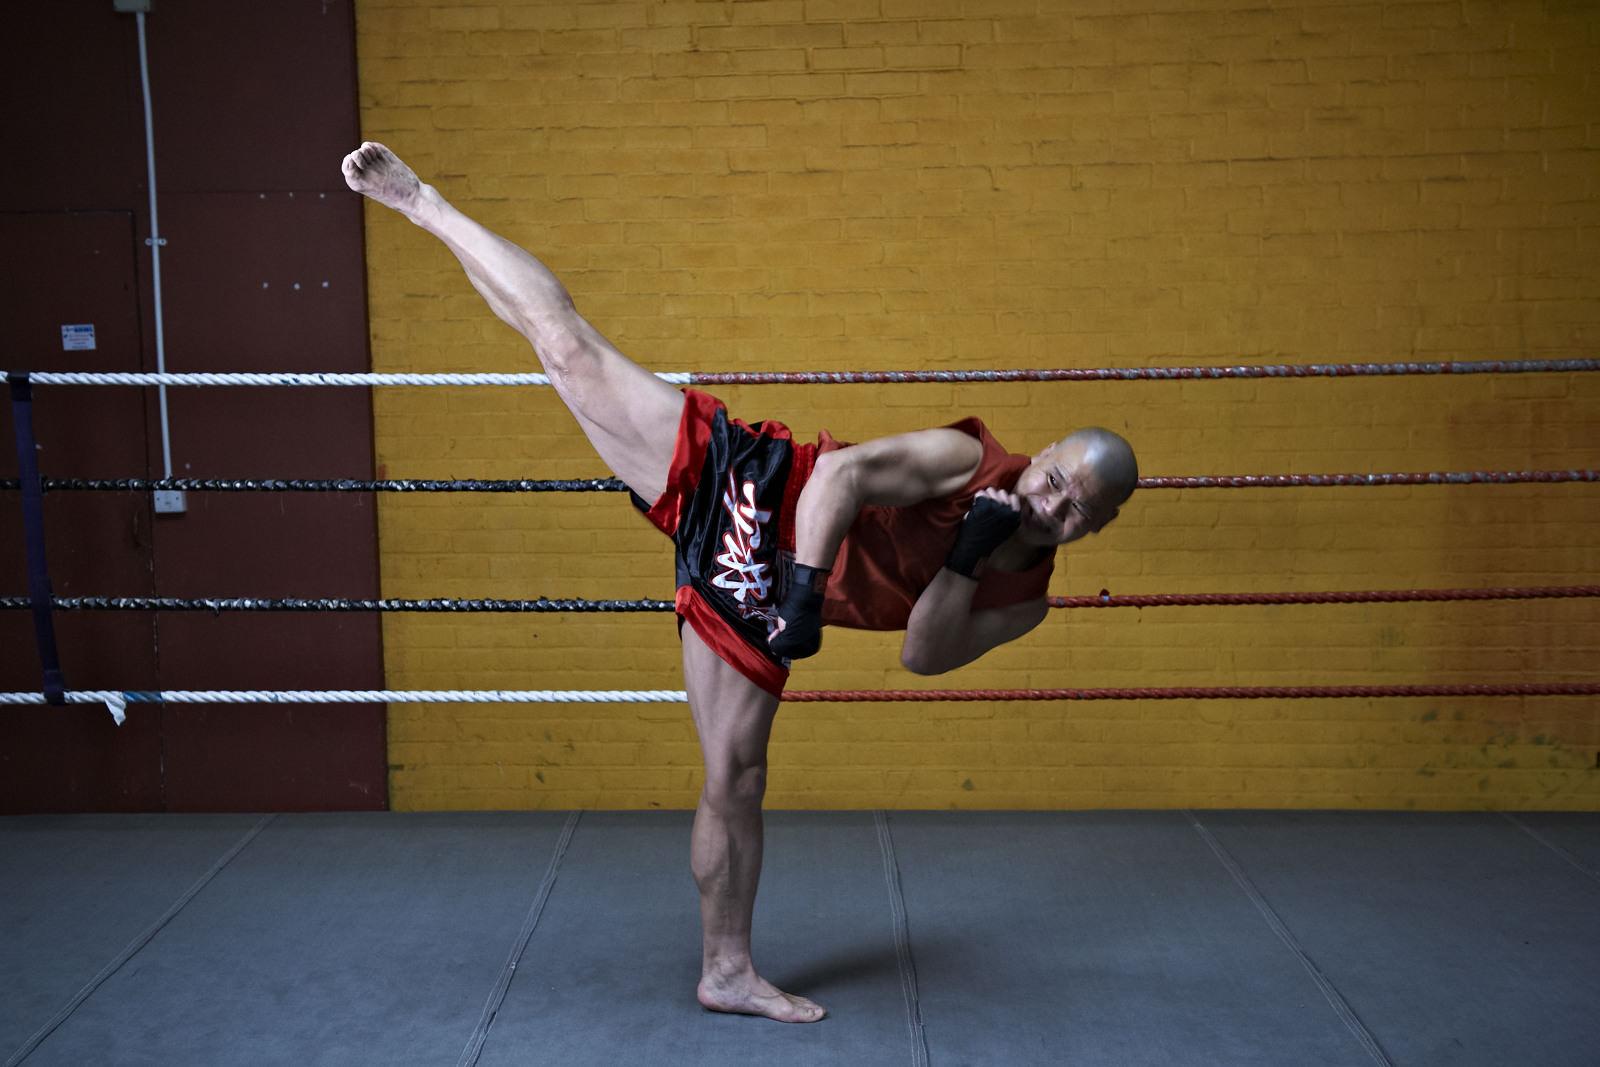 Shaolin temple uk shifu yanzi kick 13.jpg